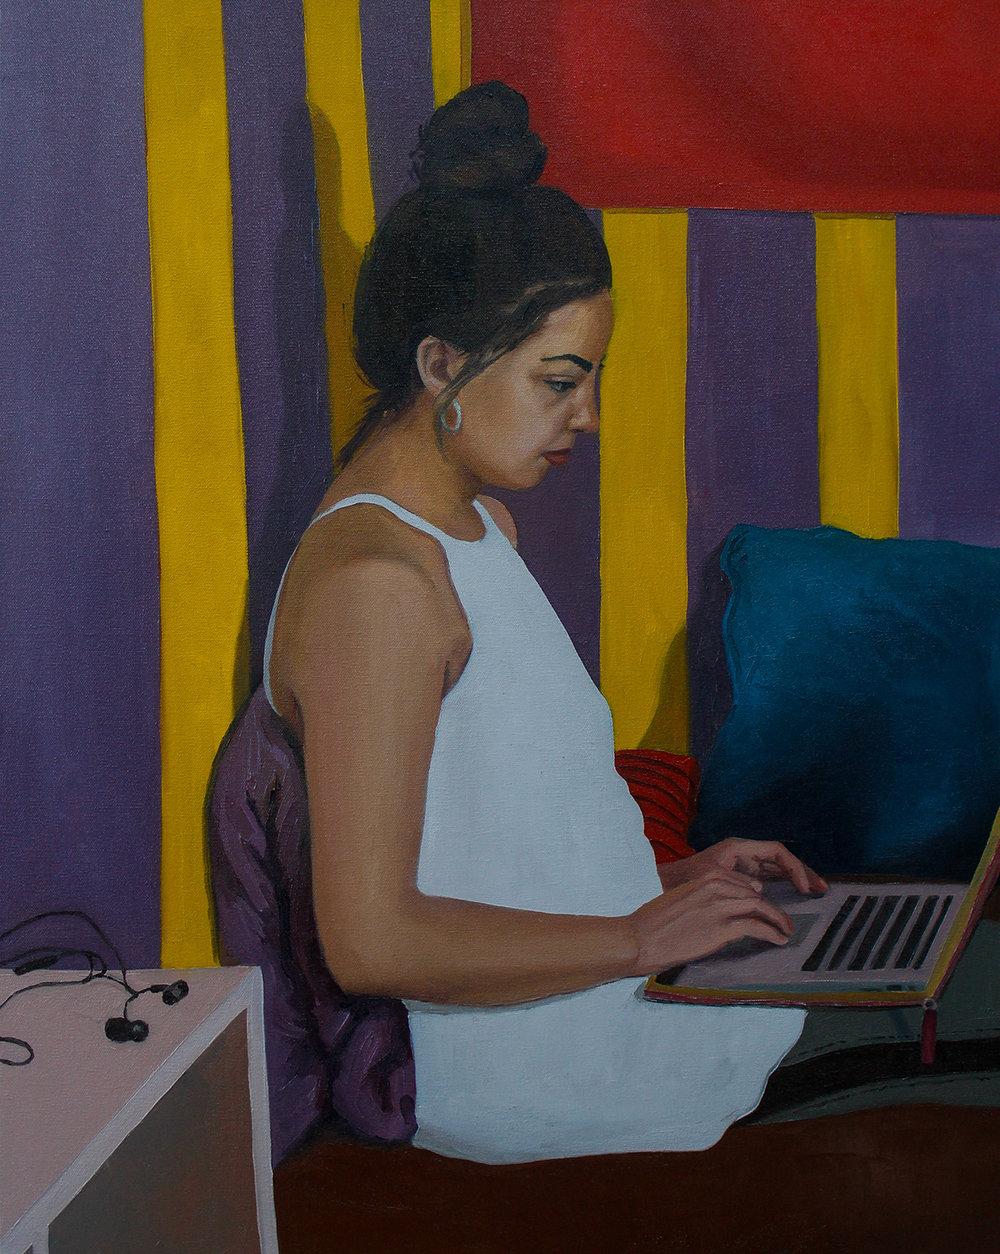 Sharraya  Oil on canvas 30 x 24 in $4,800